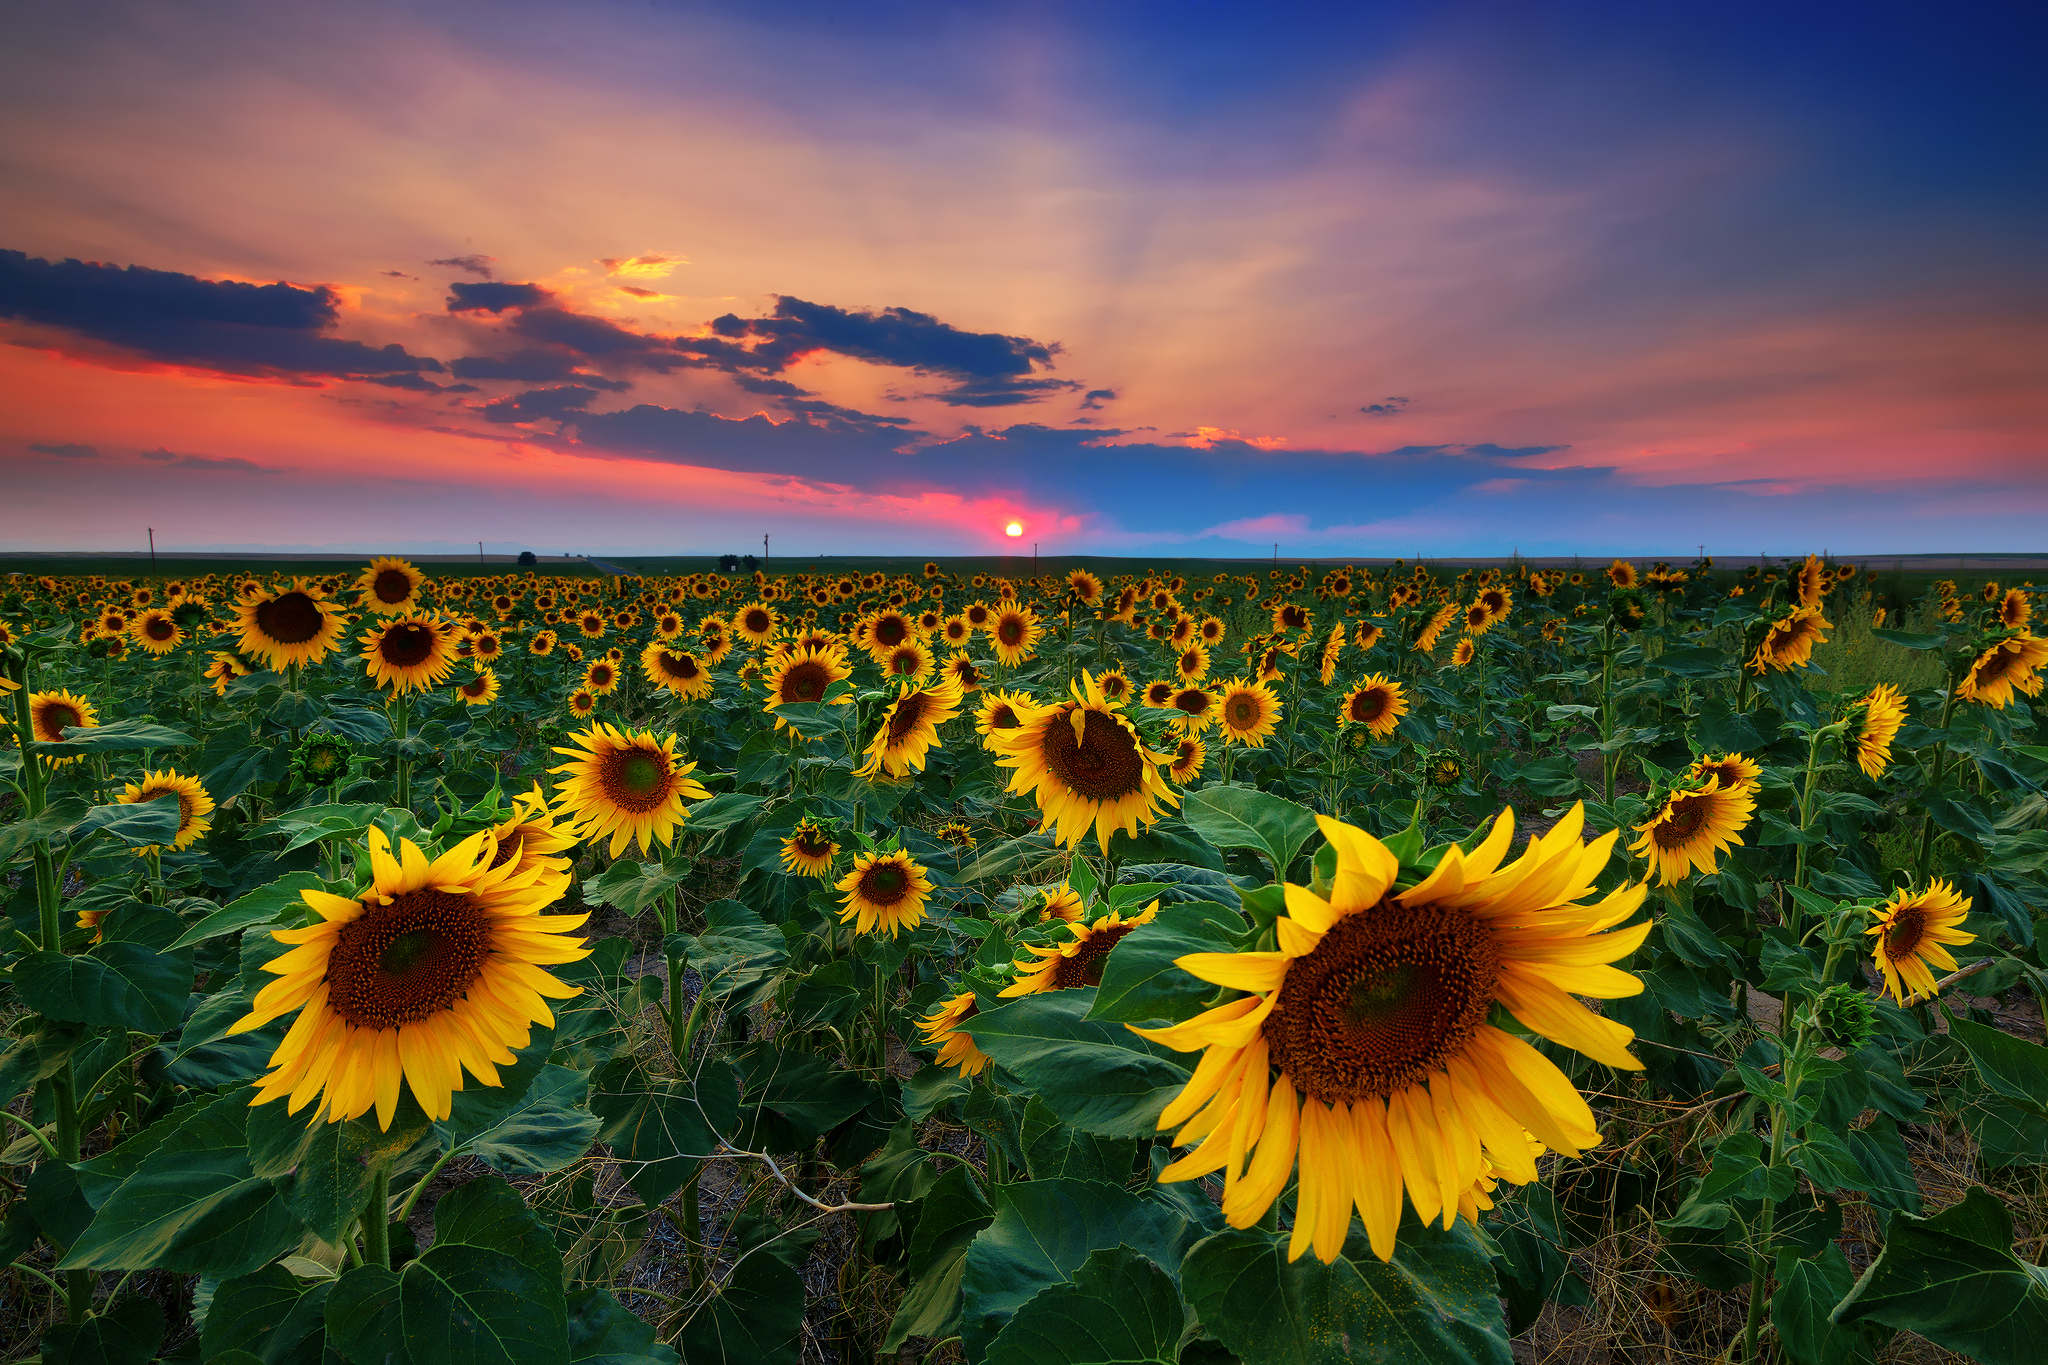 Sunflower HD Wallpaper | Background Image | 2048x1365 | ID ...